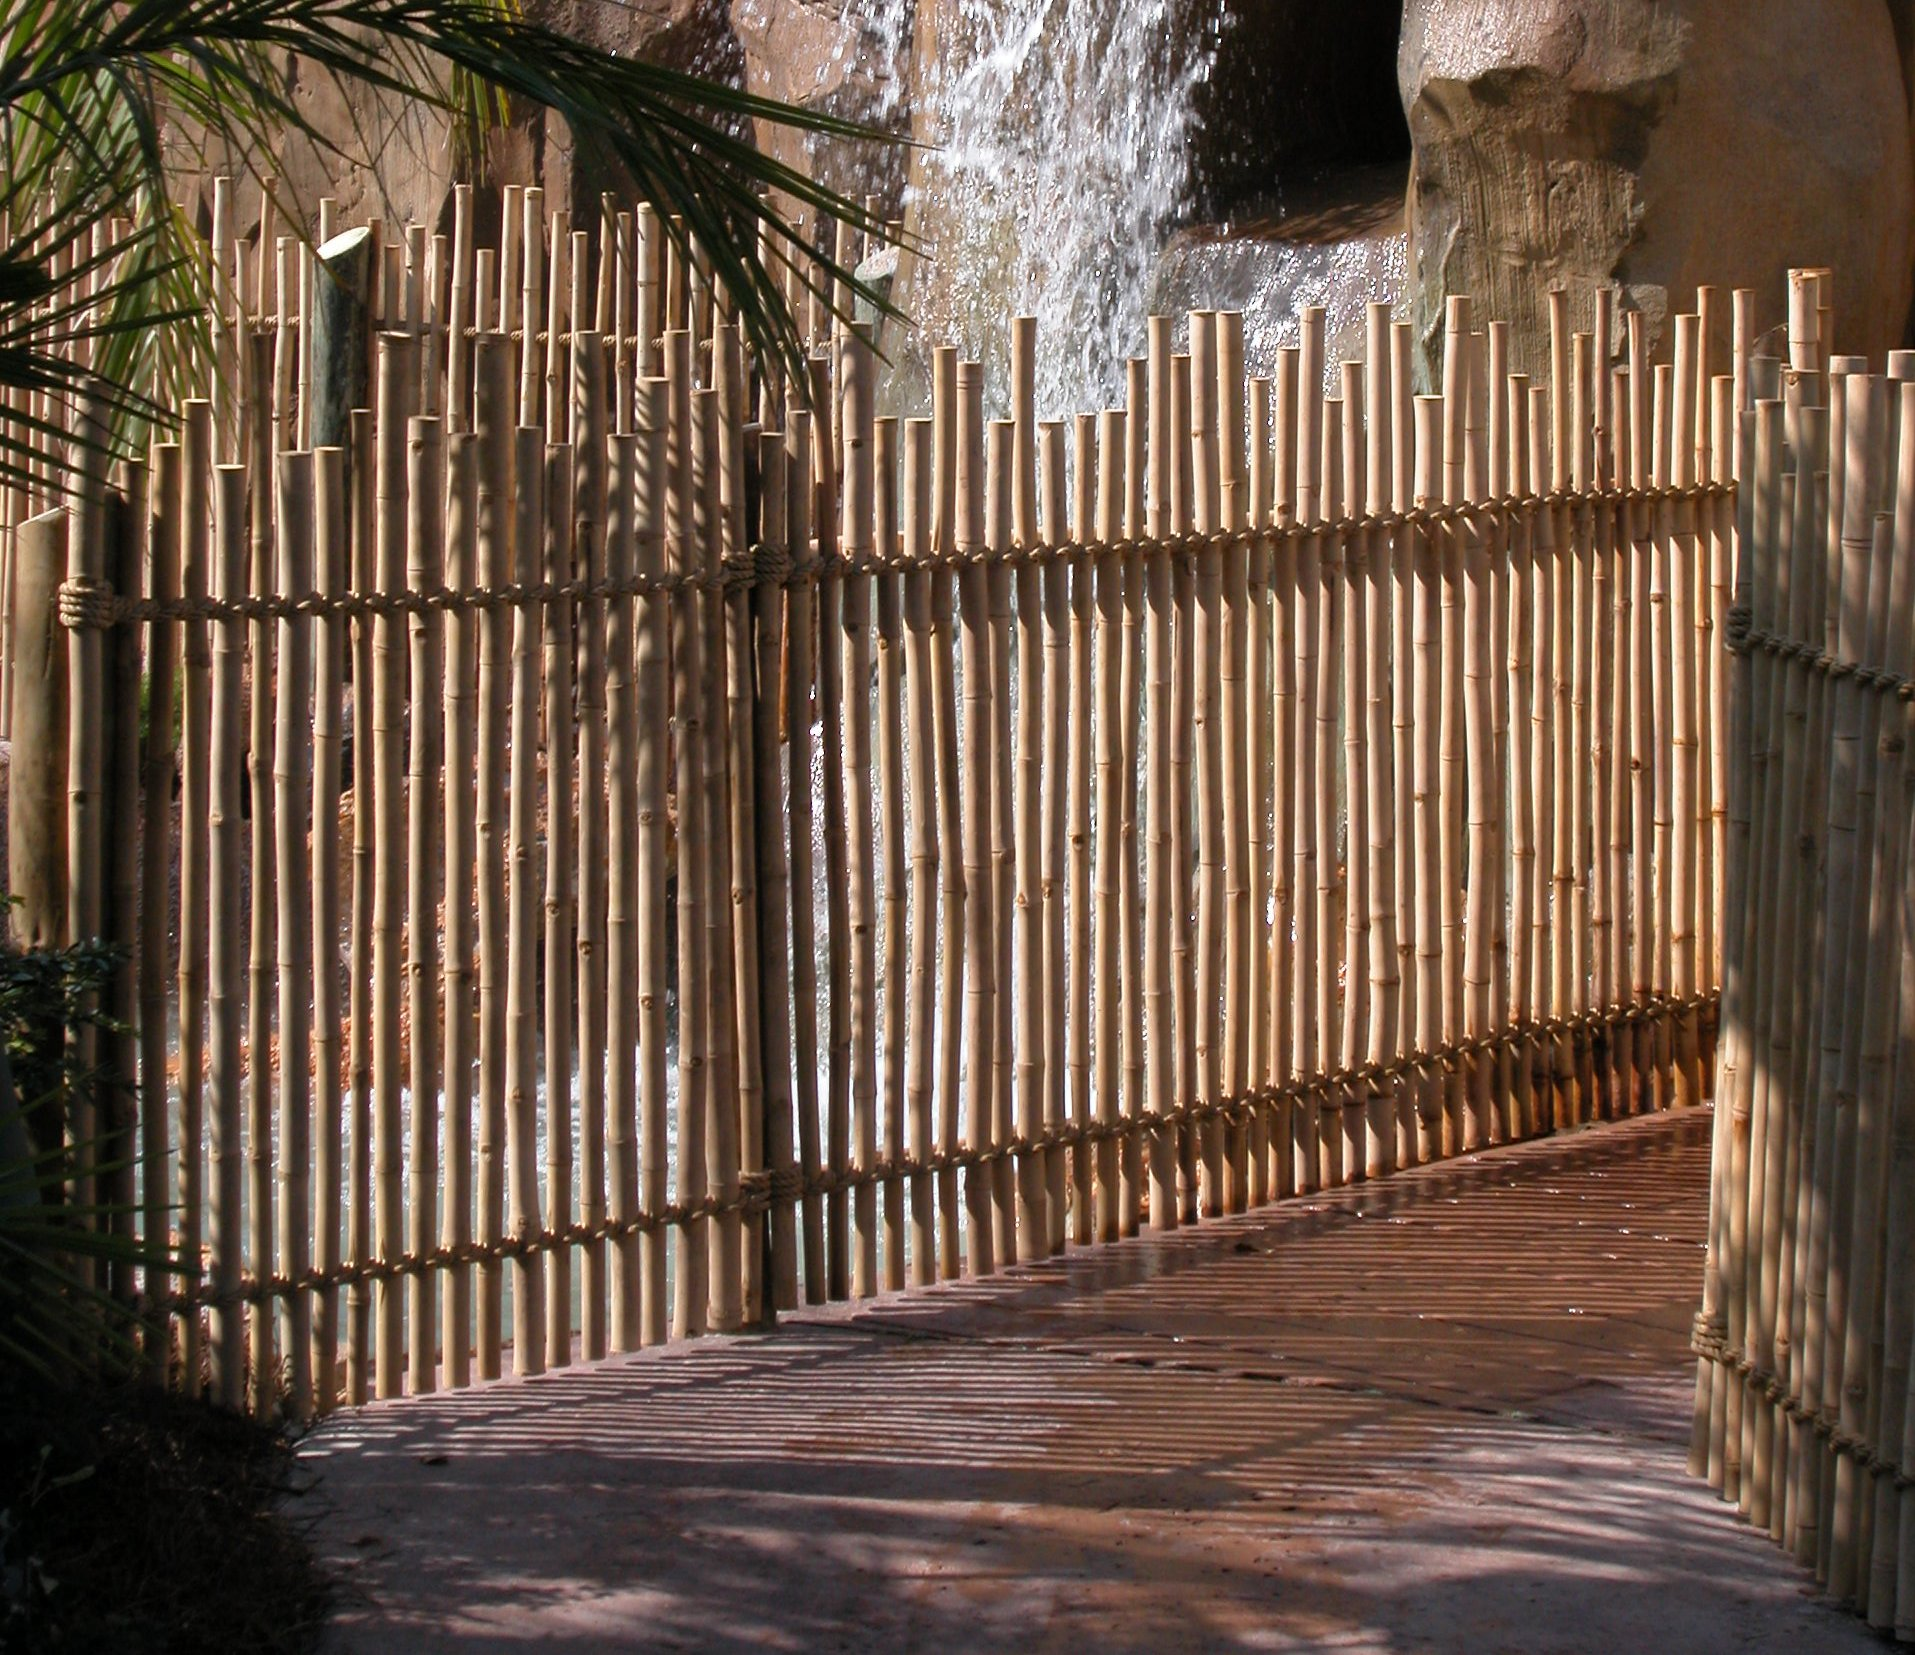 Rustic Bamboo Fencing From Amazulu Inc Amazulu